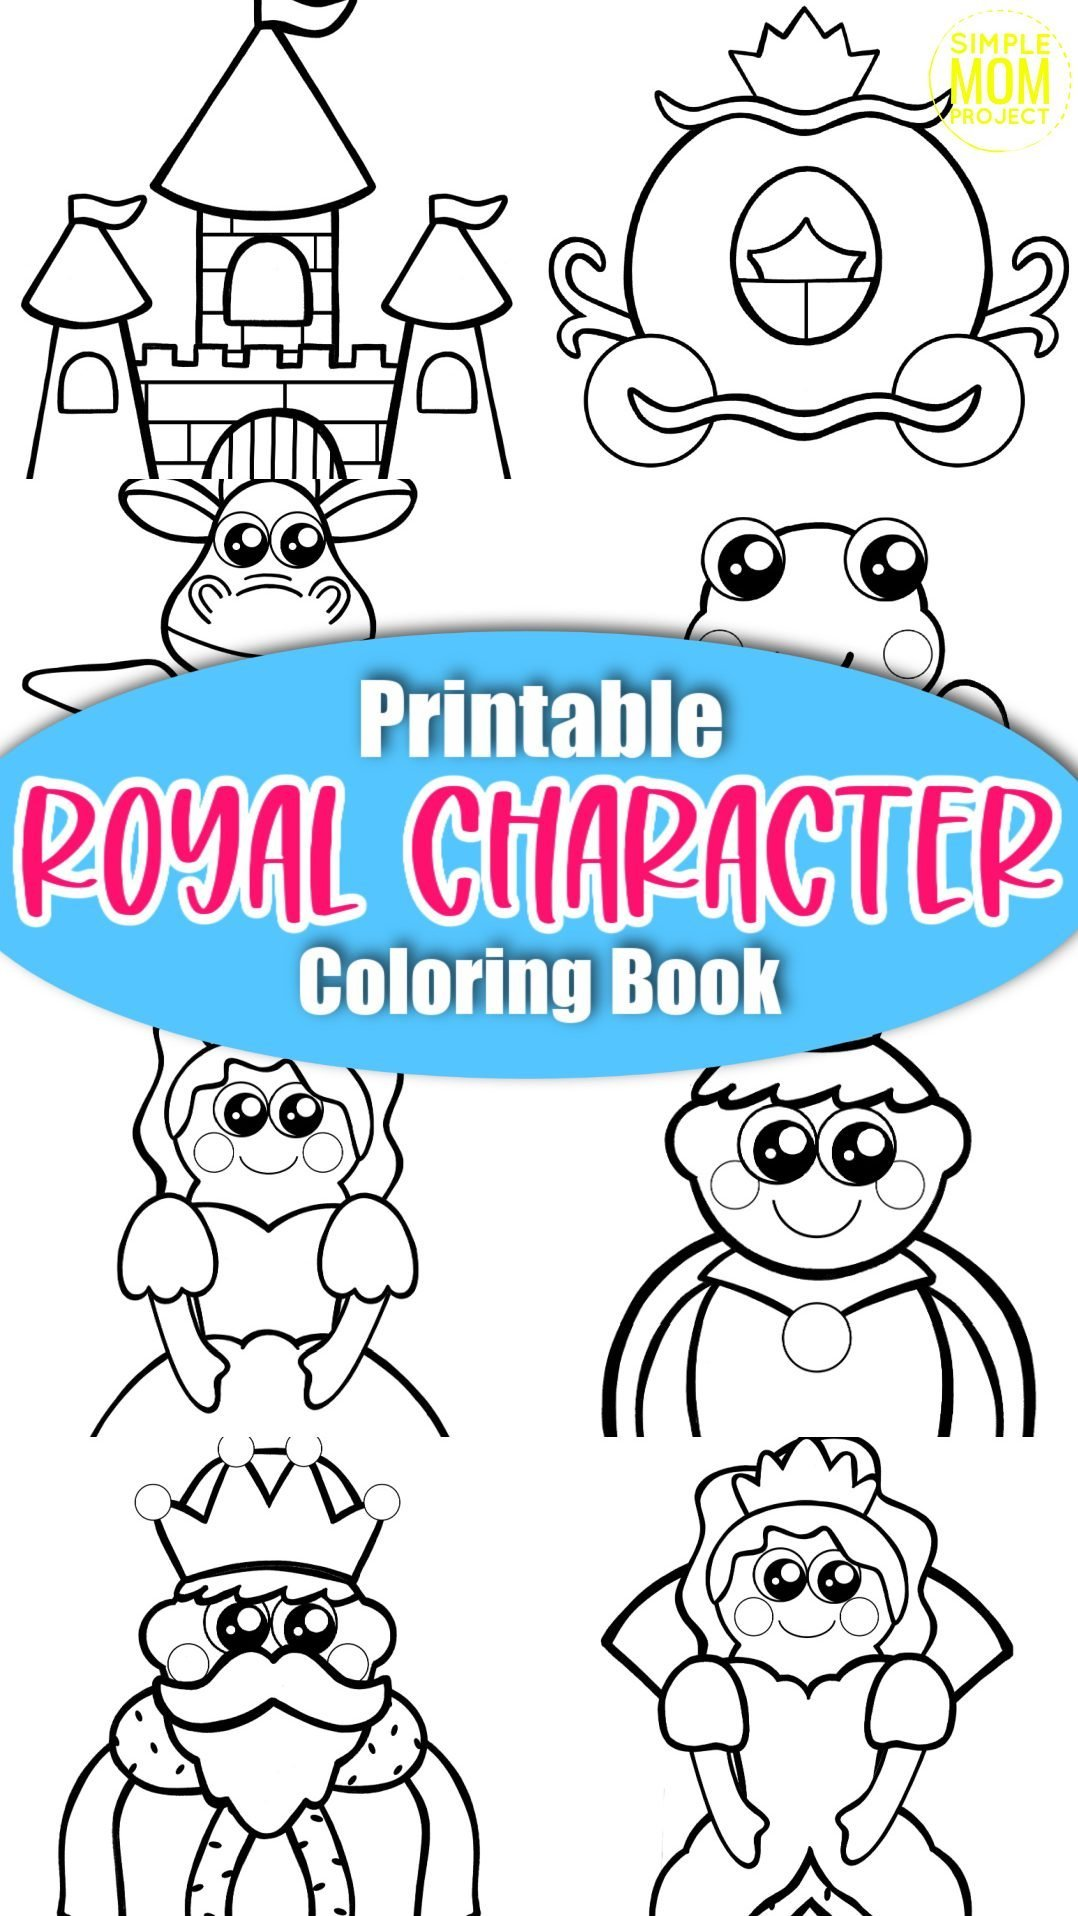 royalty storybook character coloring book for kids, preschoolers and kindergartners sales image 2